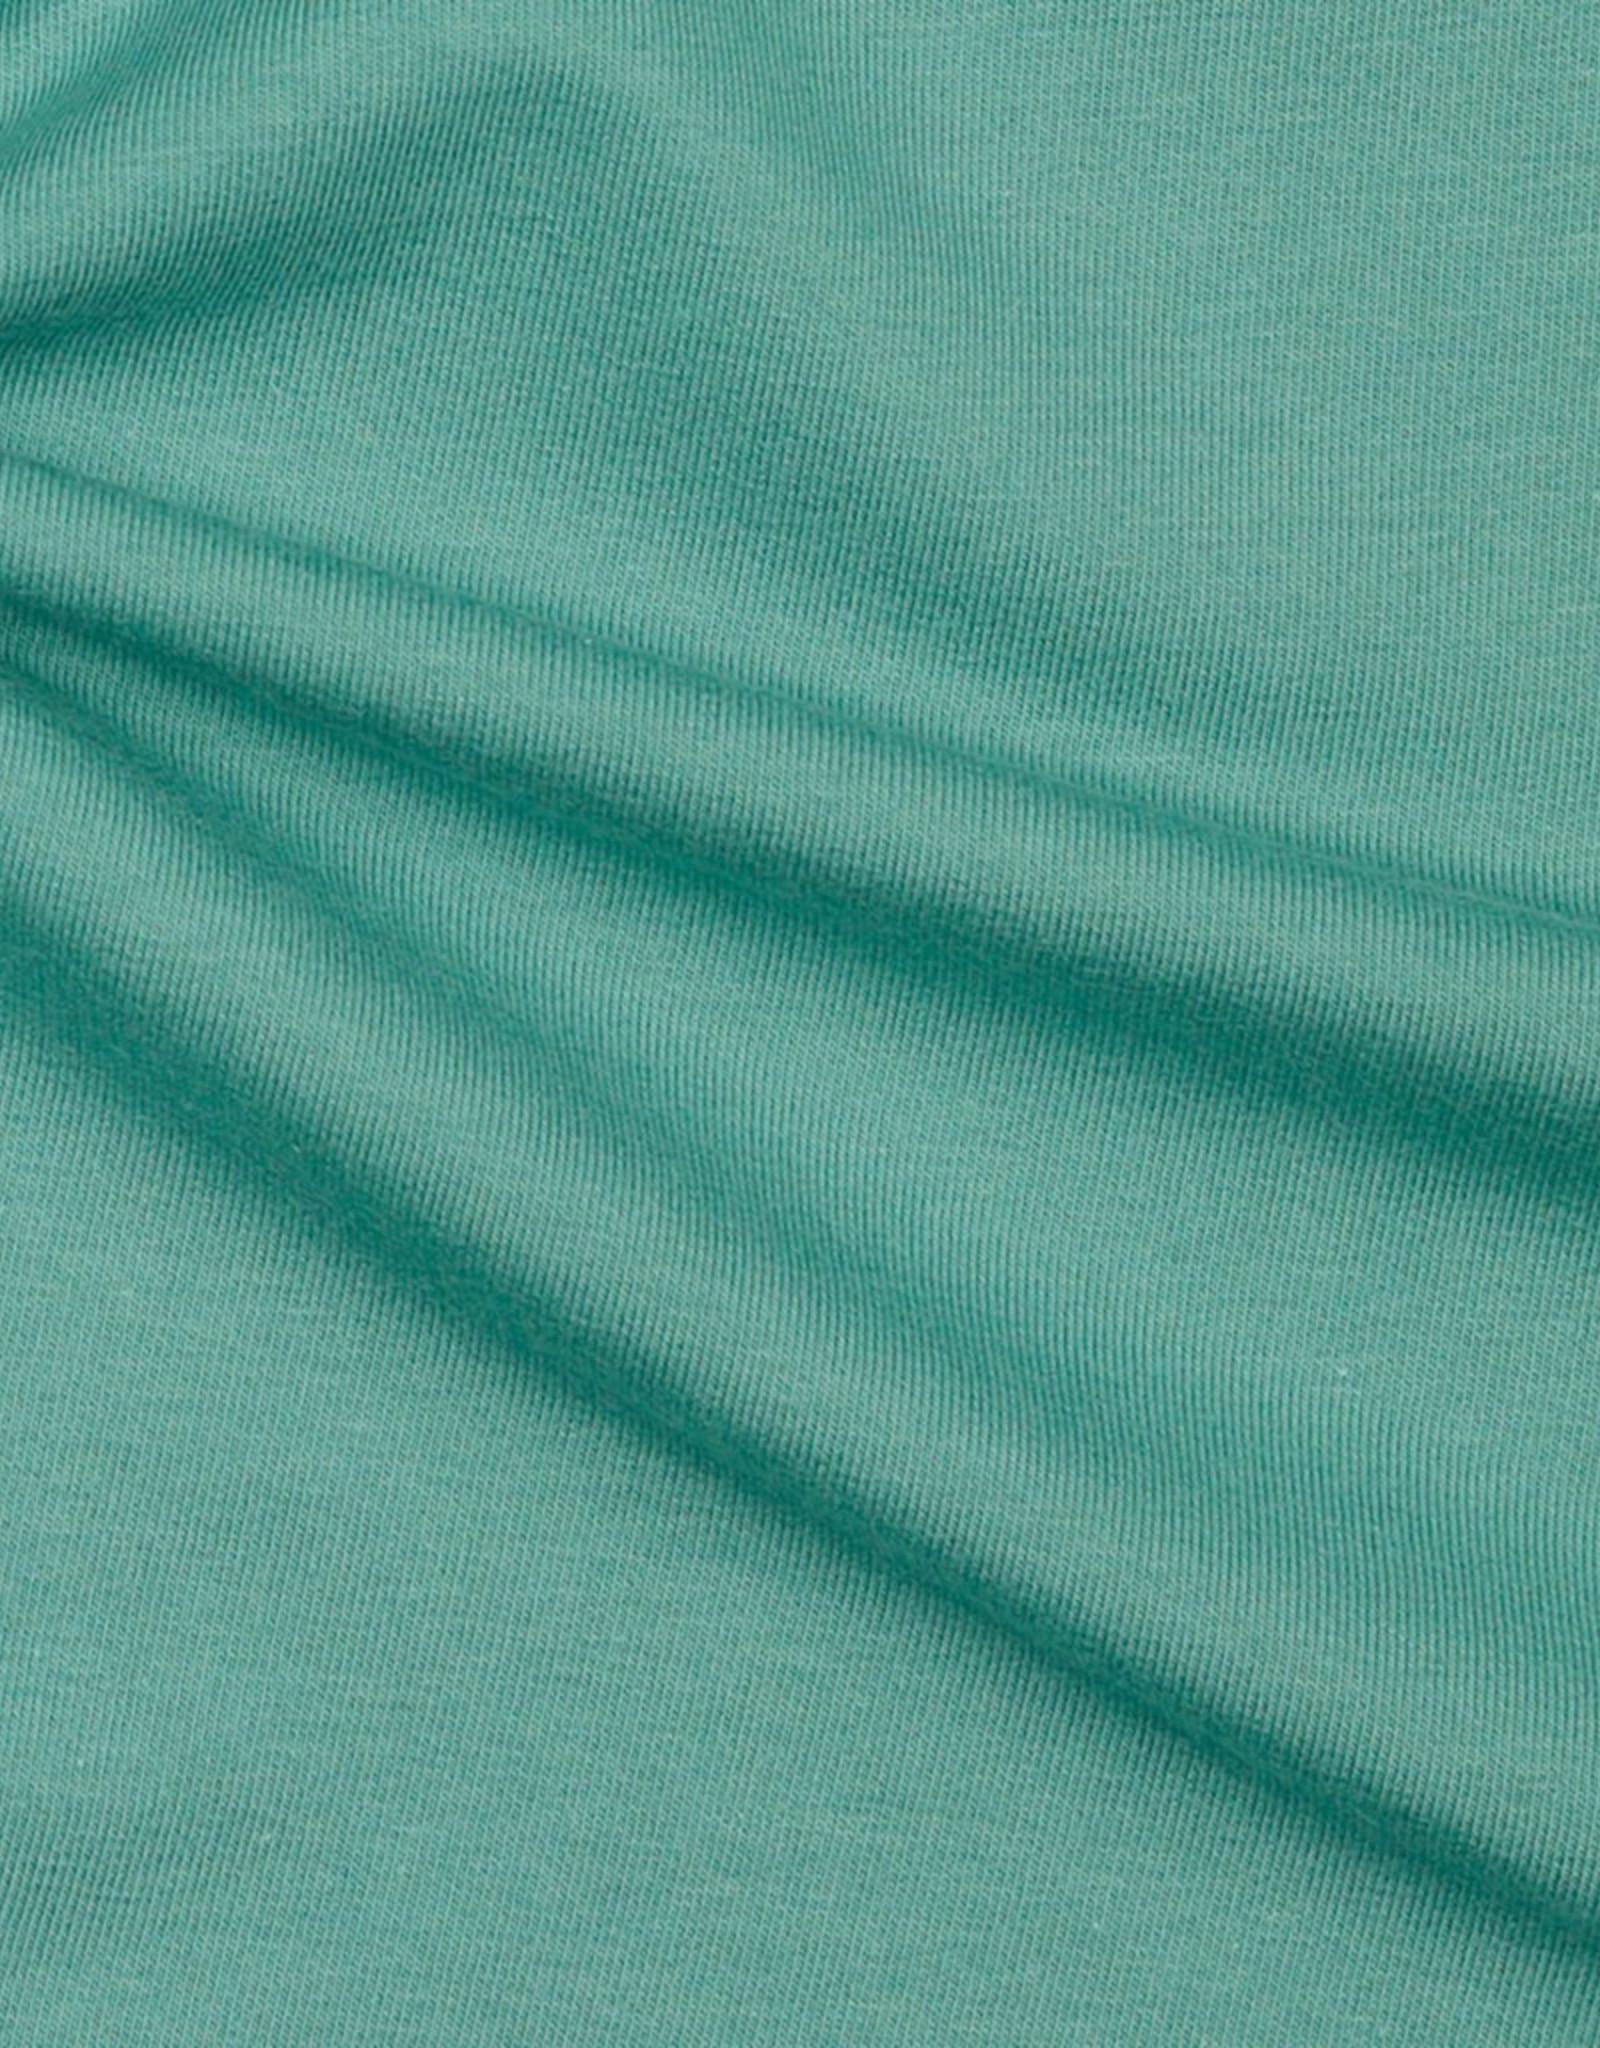 Stik-Stof French terry uni gots donker mint groen